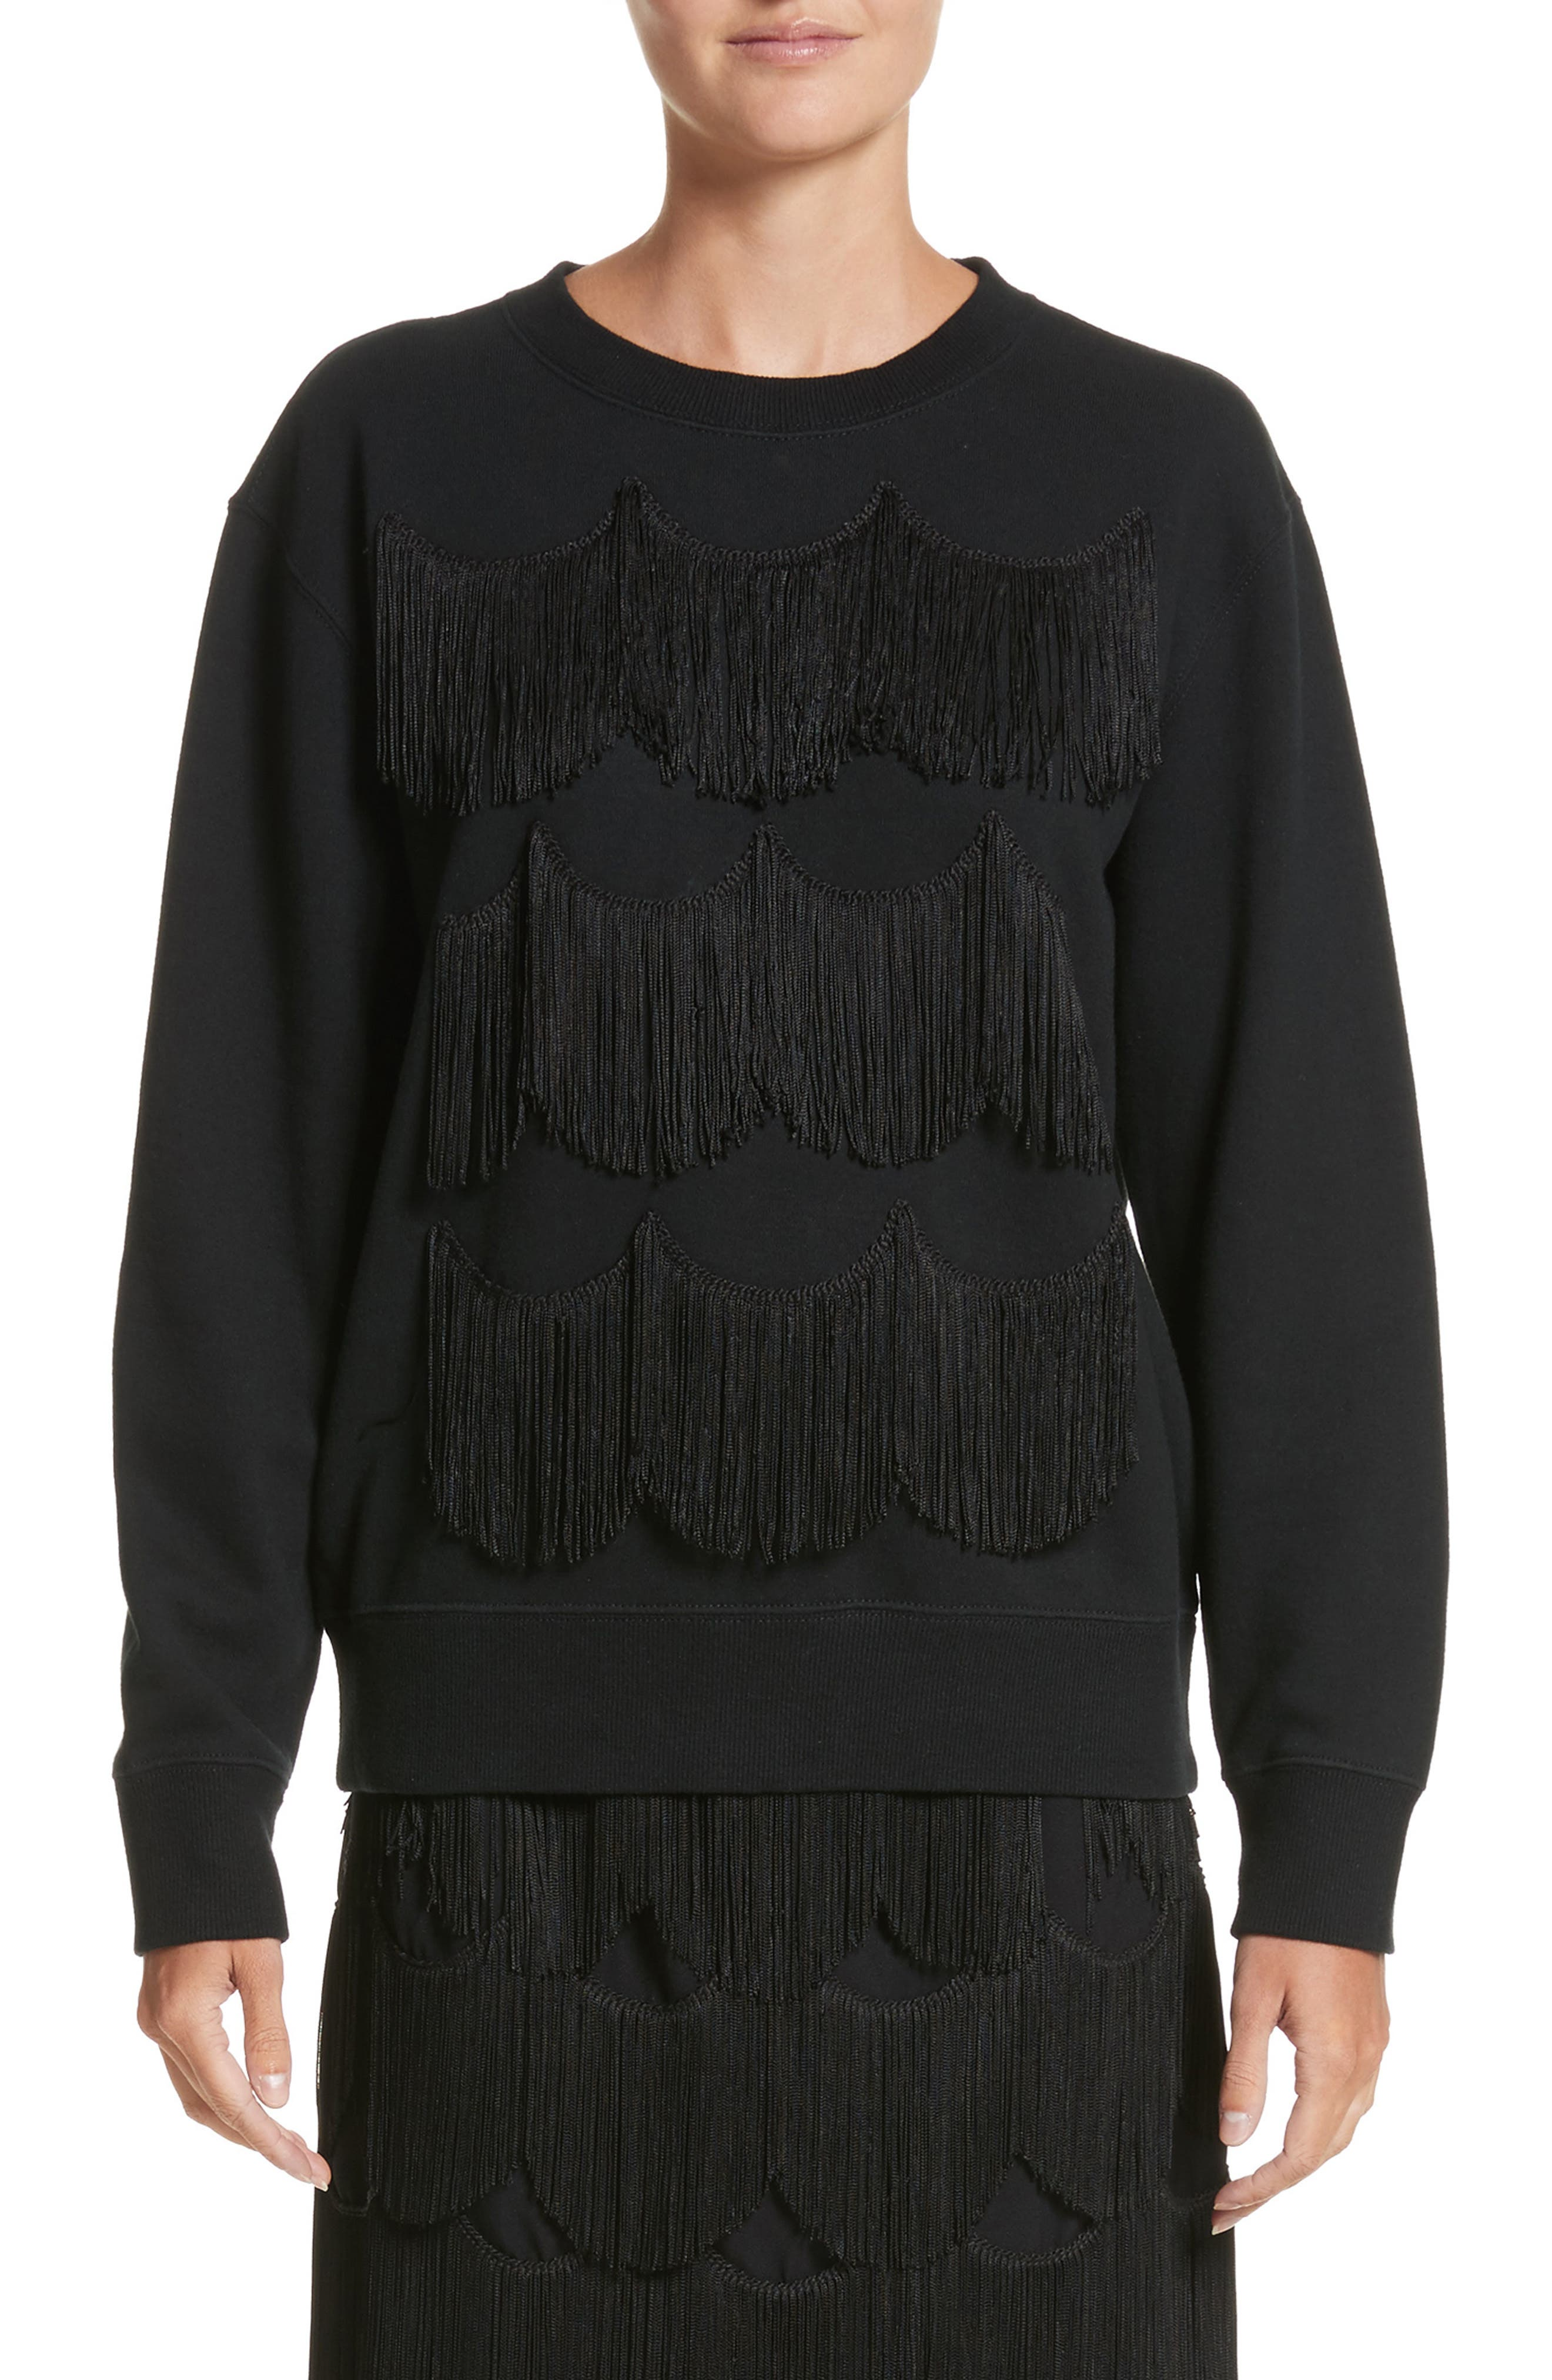 MARC JACOBS Fringe Cotton Sweatshirt